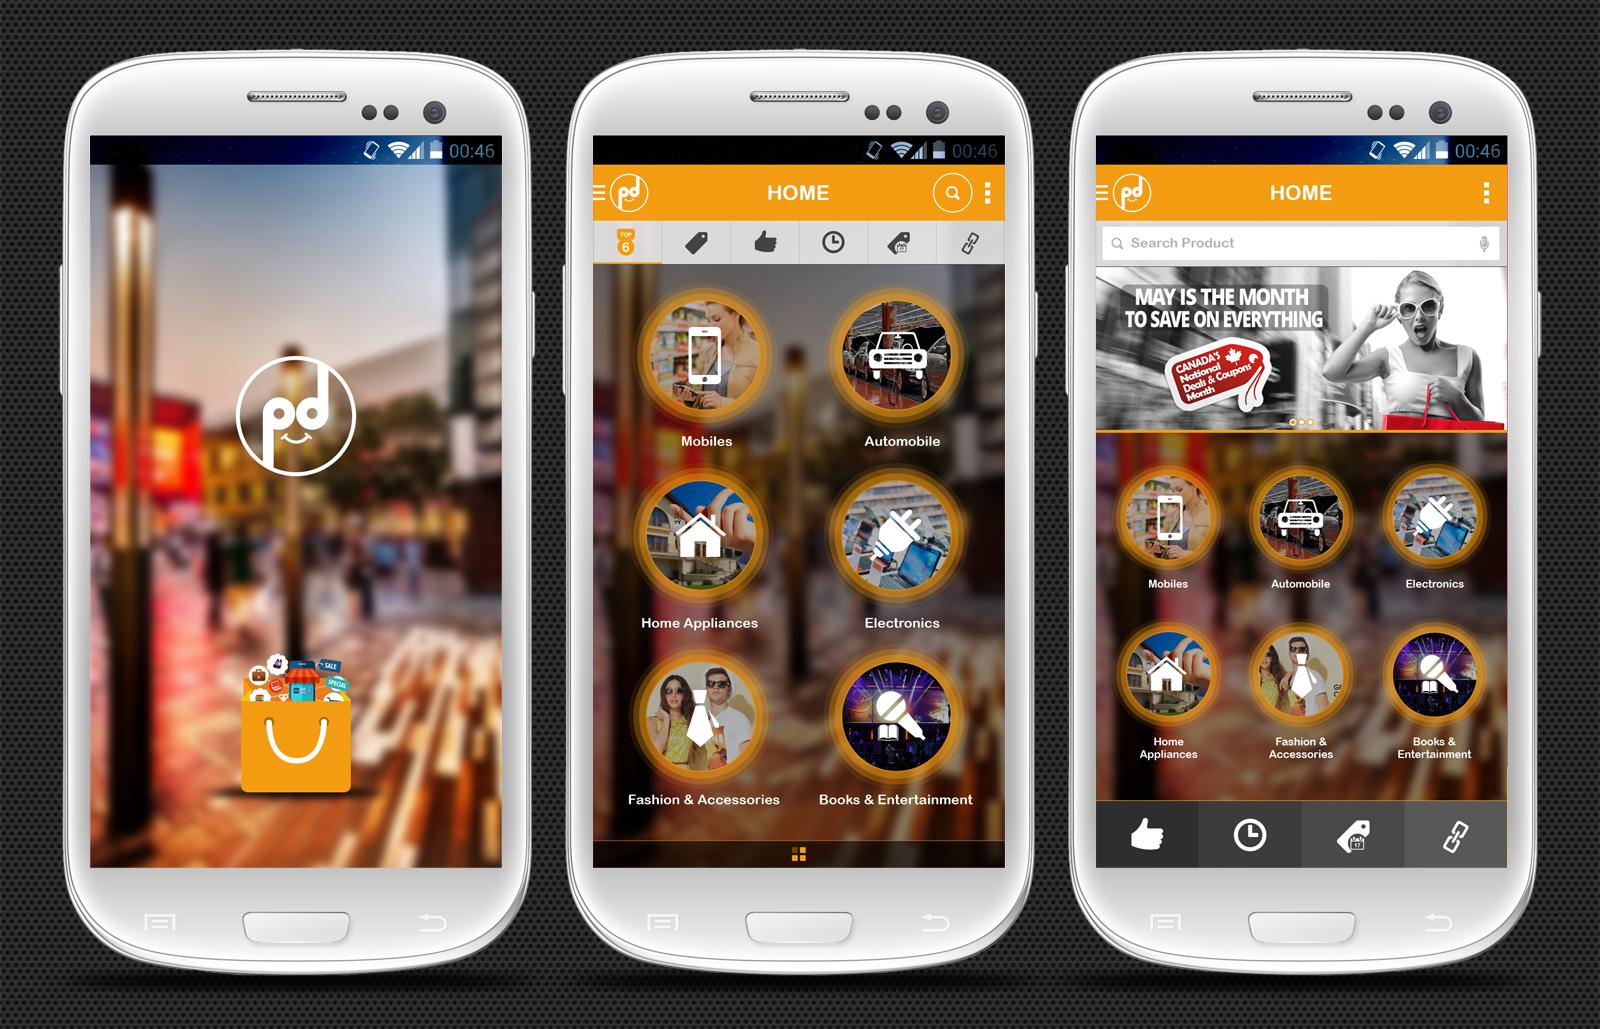 Iphone Wallpaper Psd Template Shopping App Concept Design